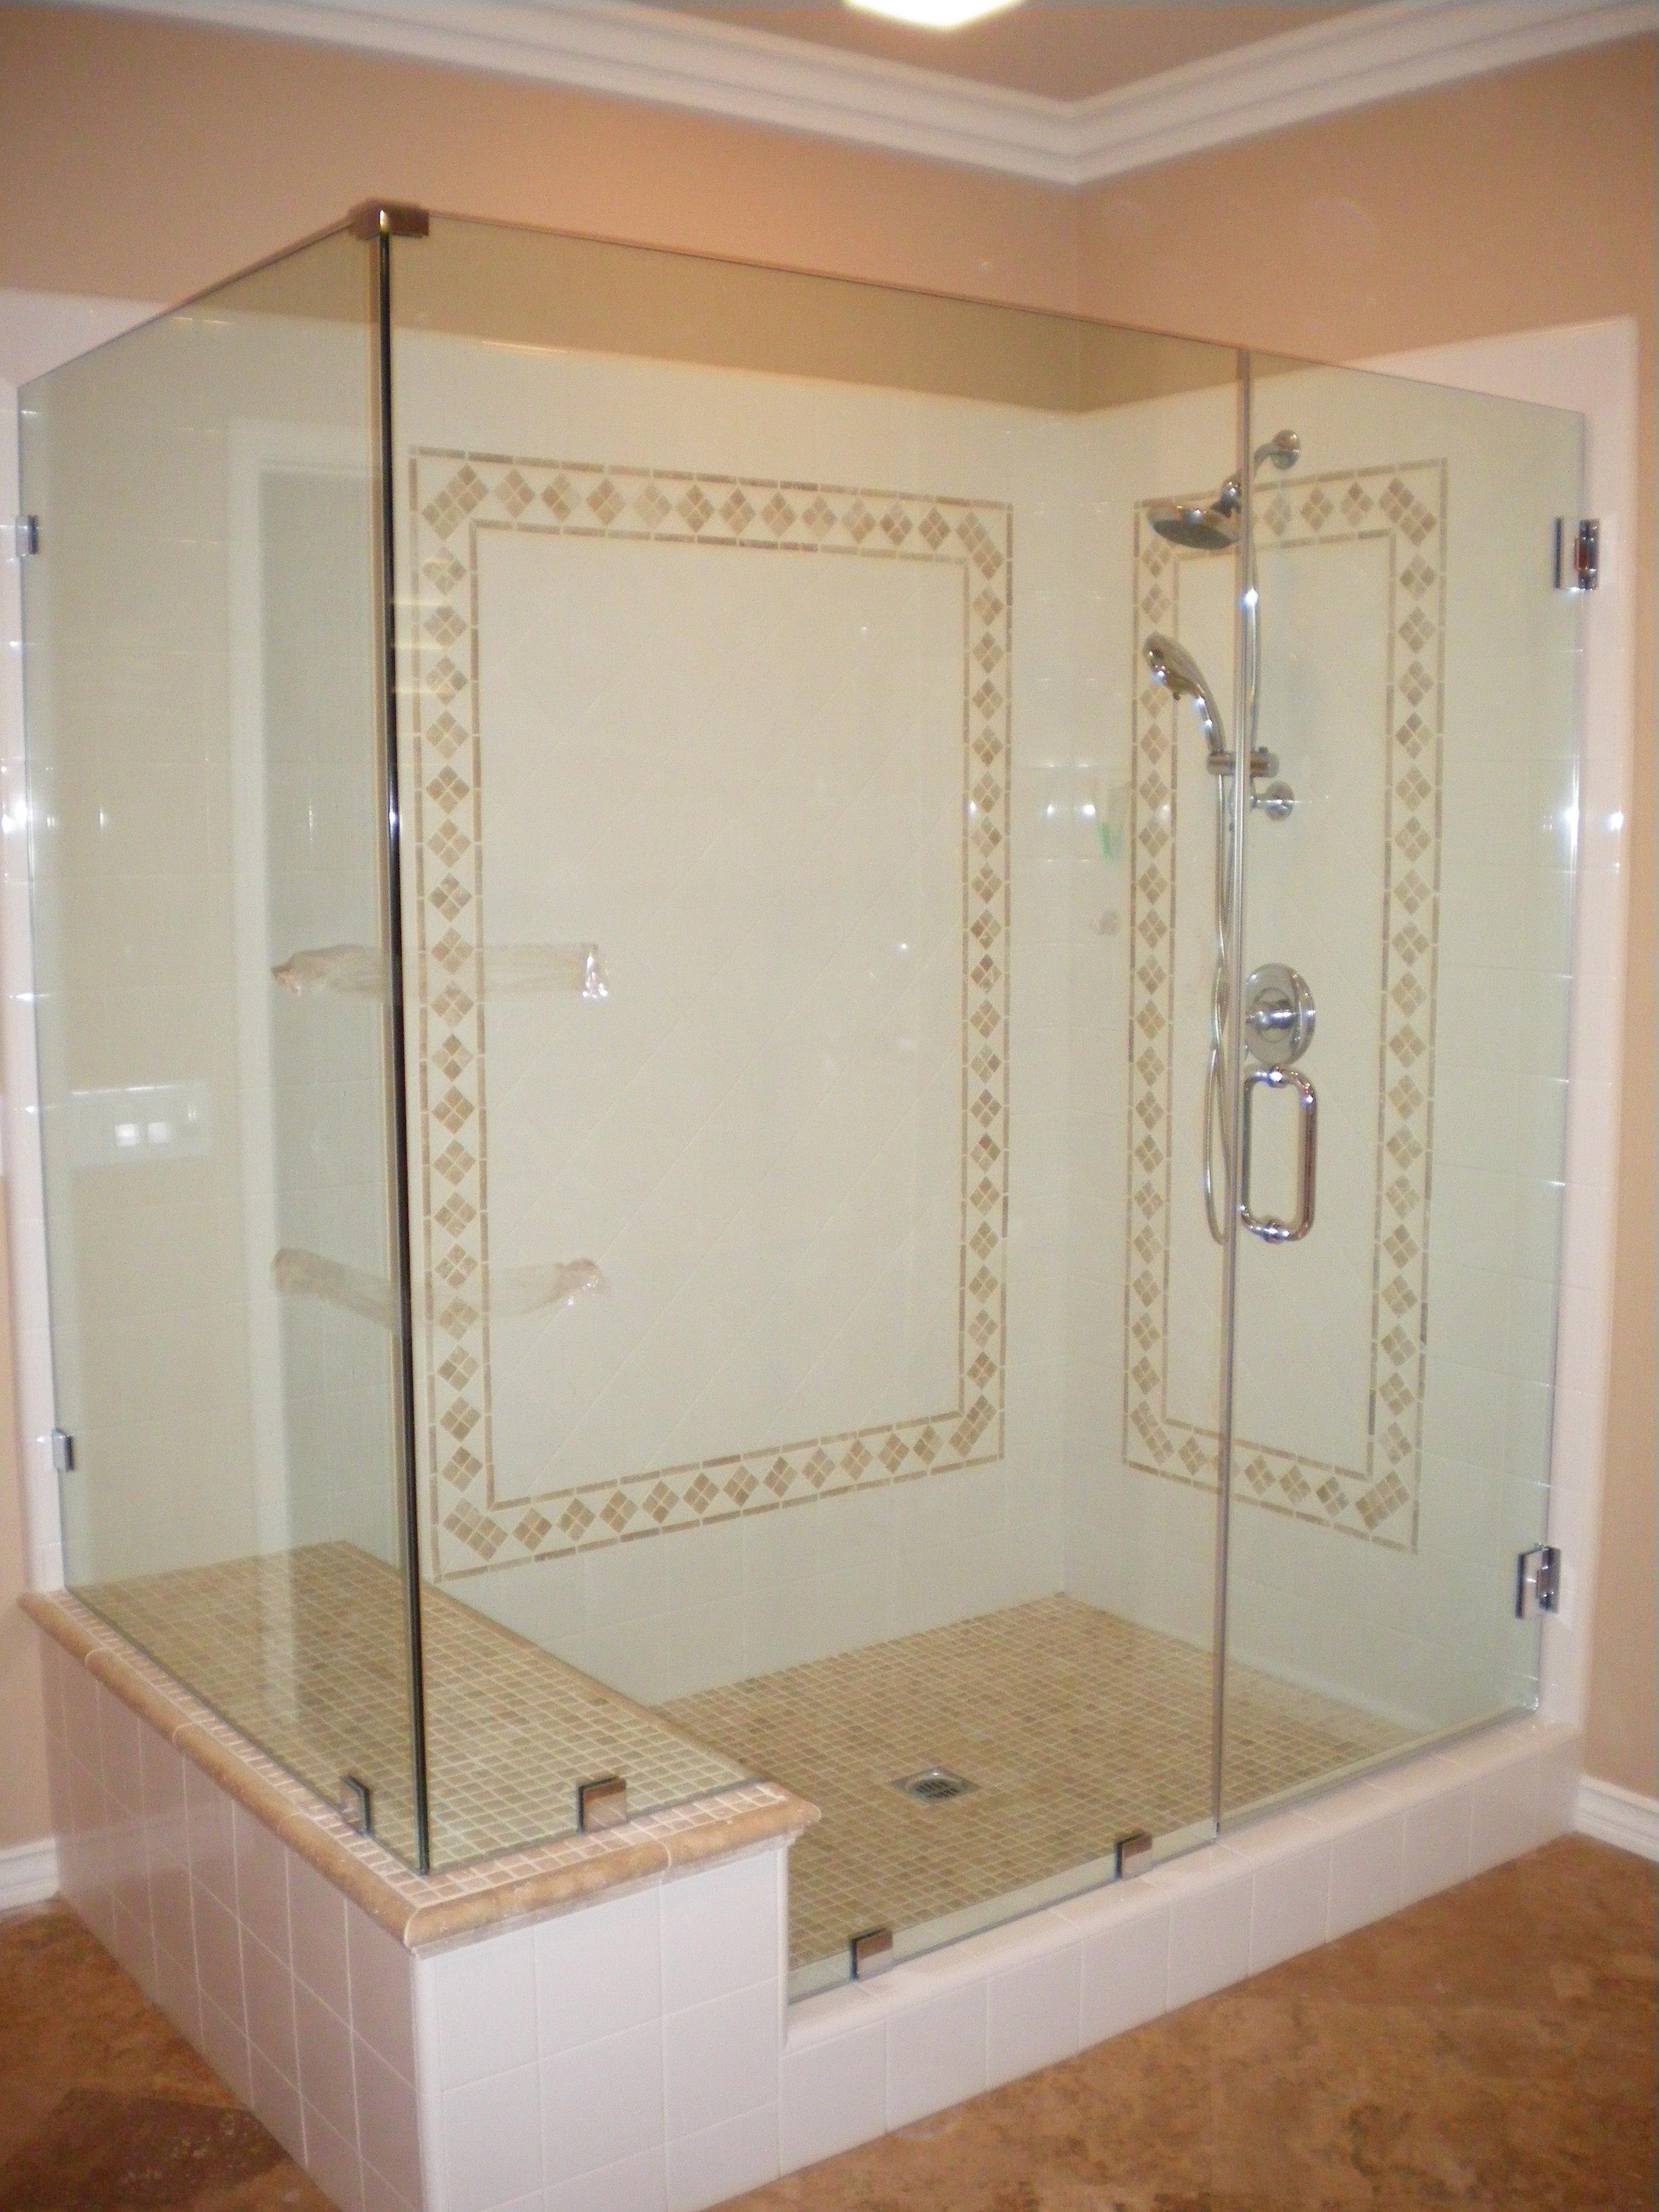 Shower-Doors-Residential-Photos-7.jpg